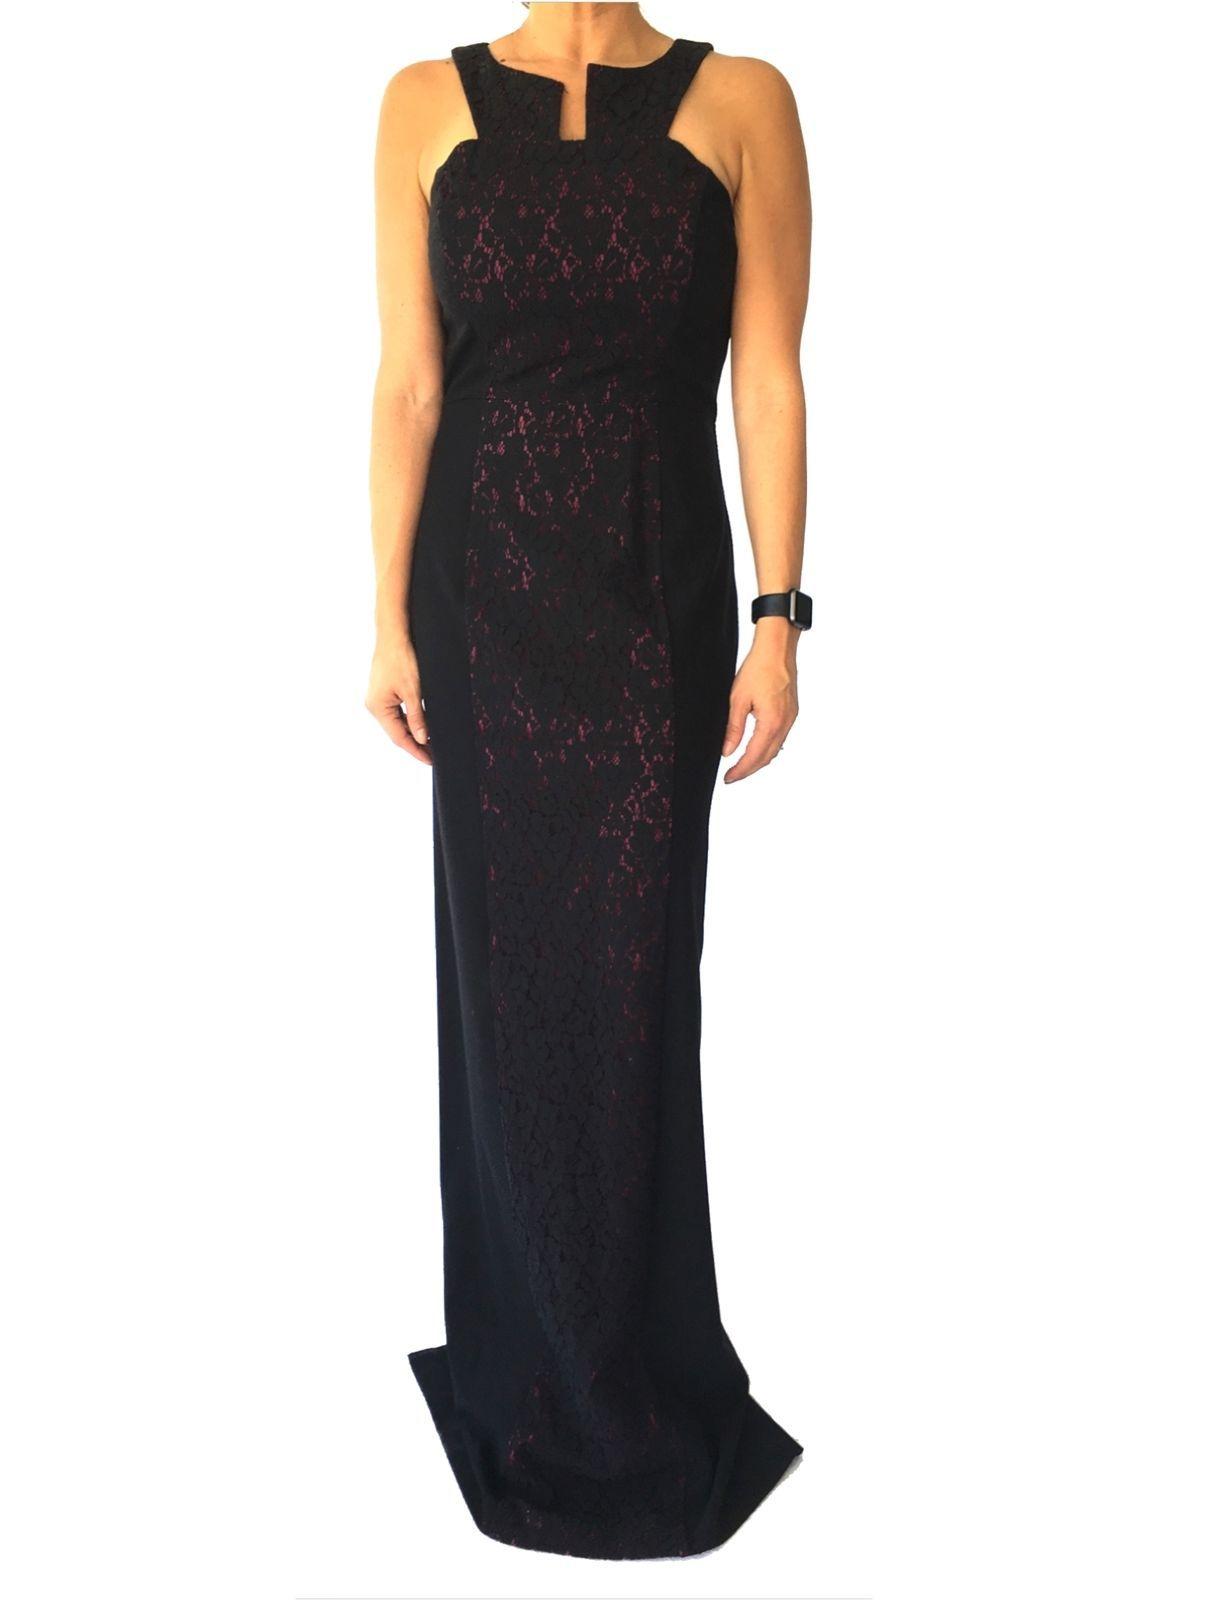 Awesome amazing black halo eve black lace gown dress medium nwt